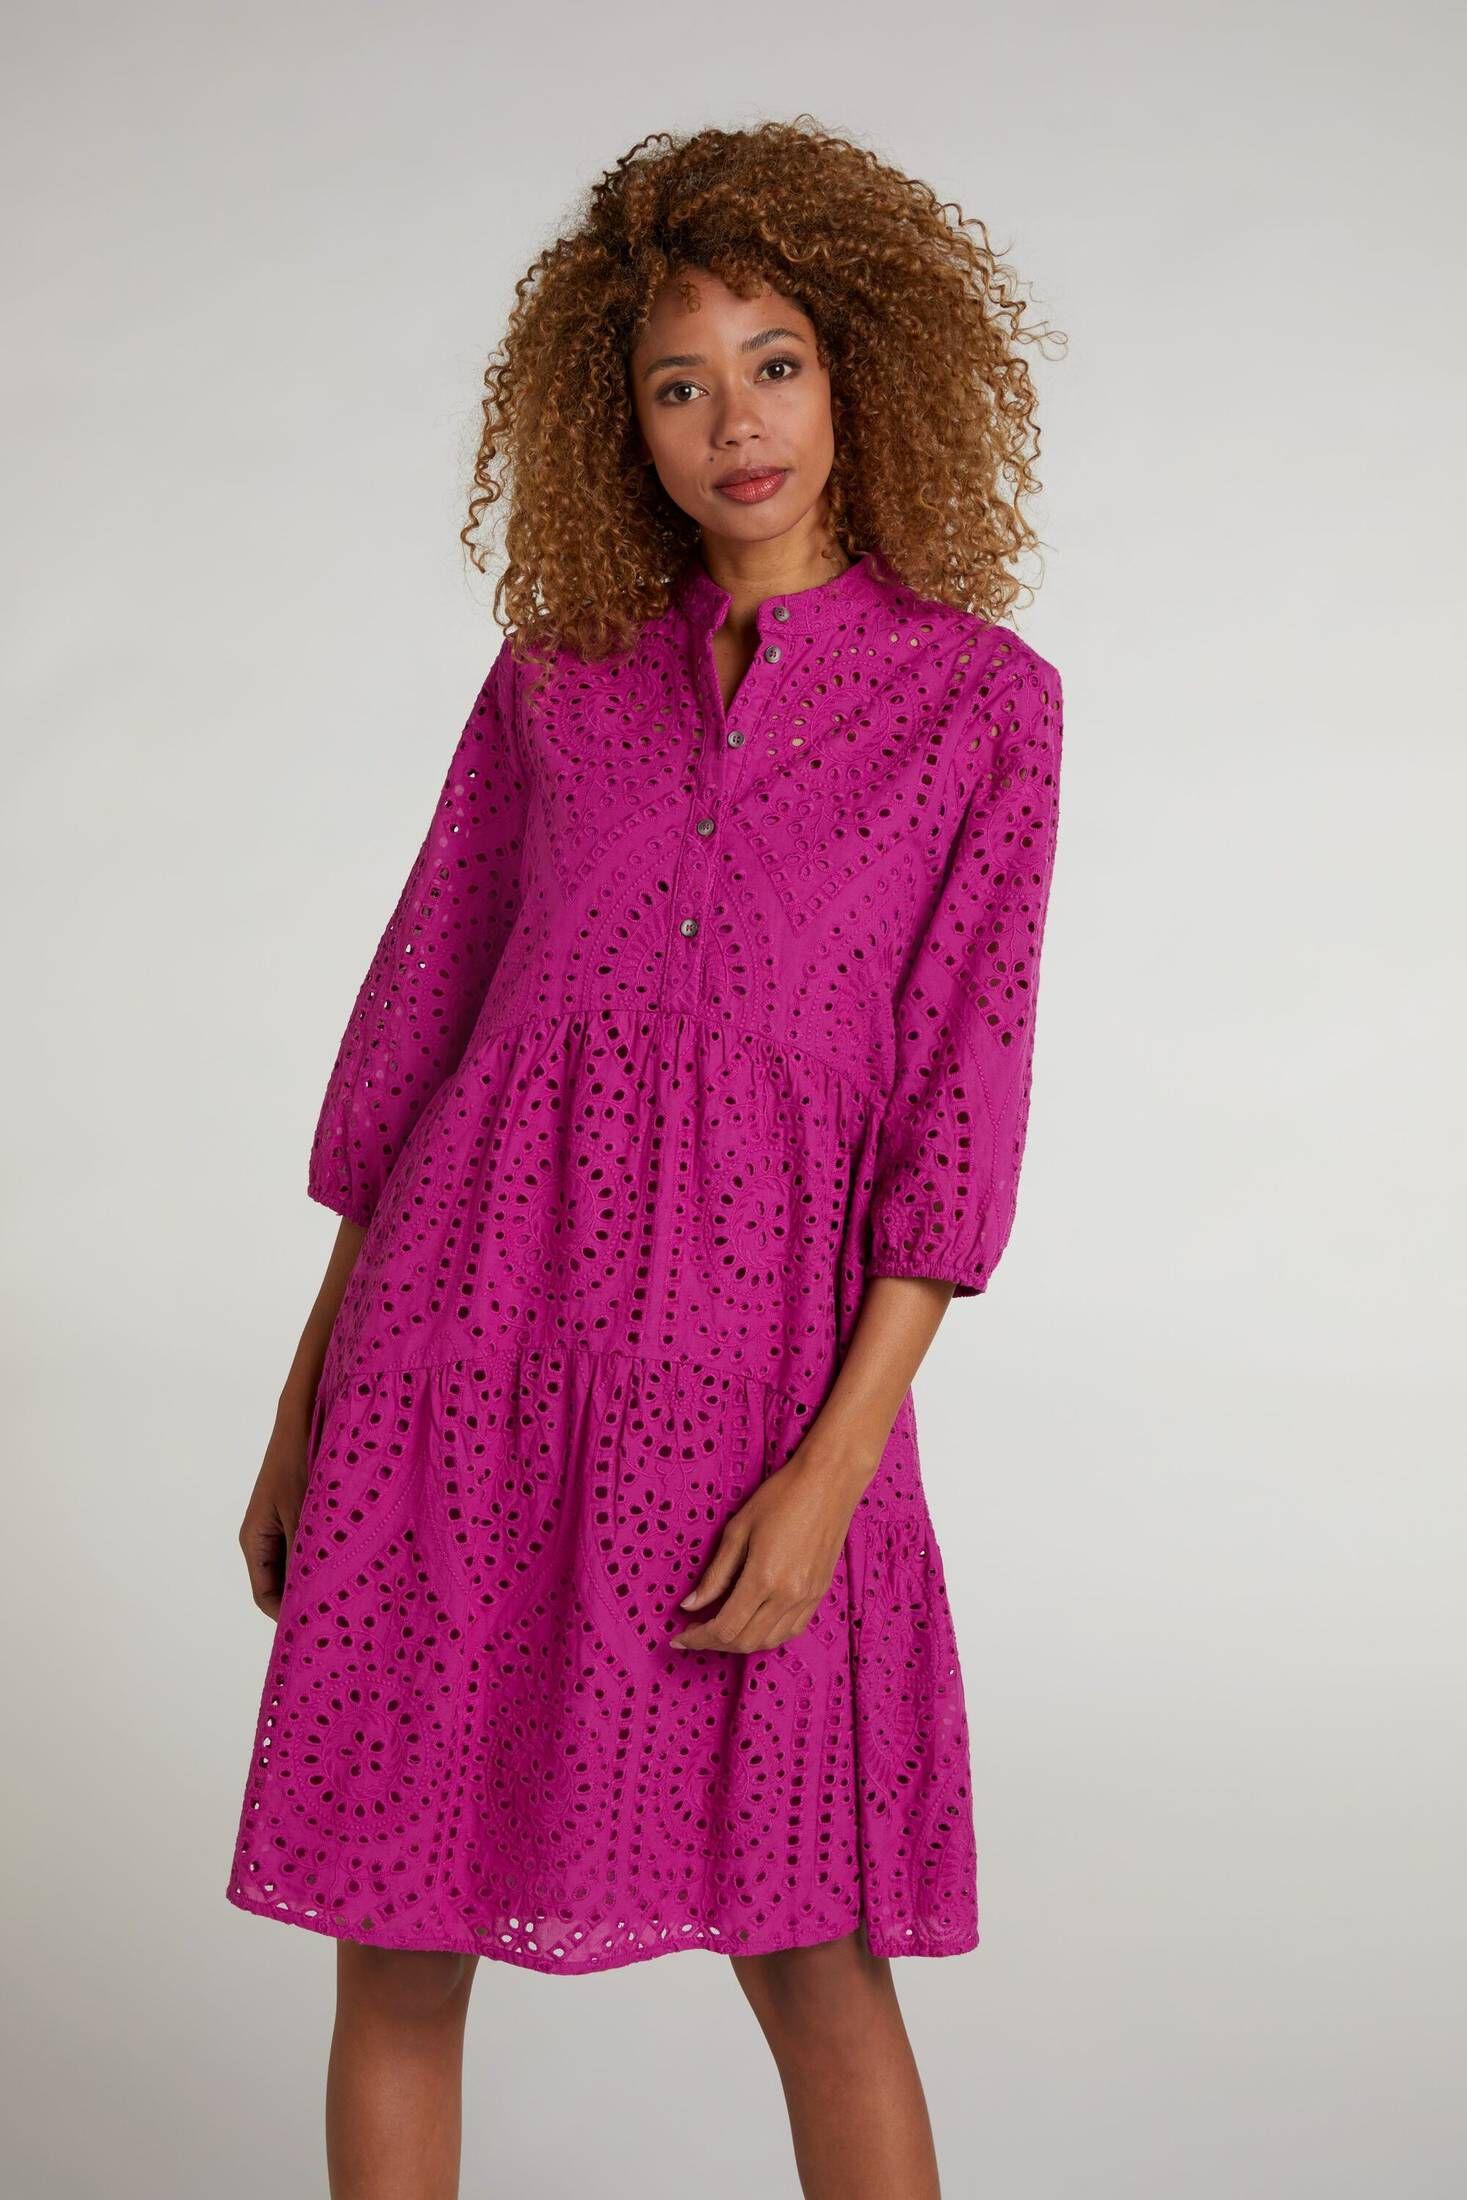 Oui Damen Kleid 9/9 Arm kaufen   engelhorn